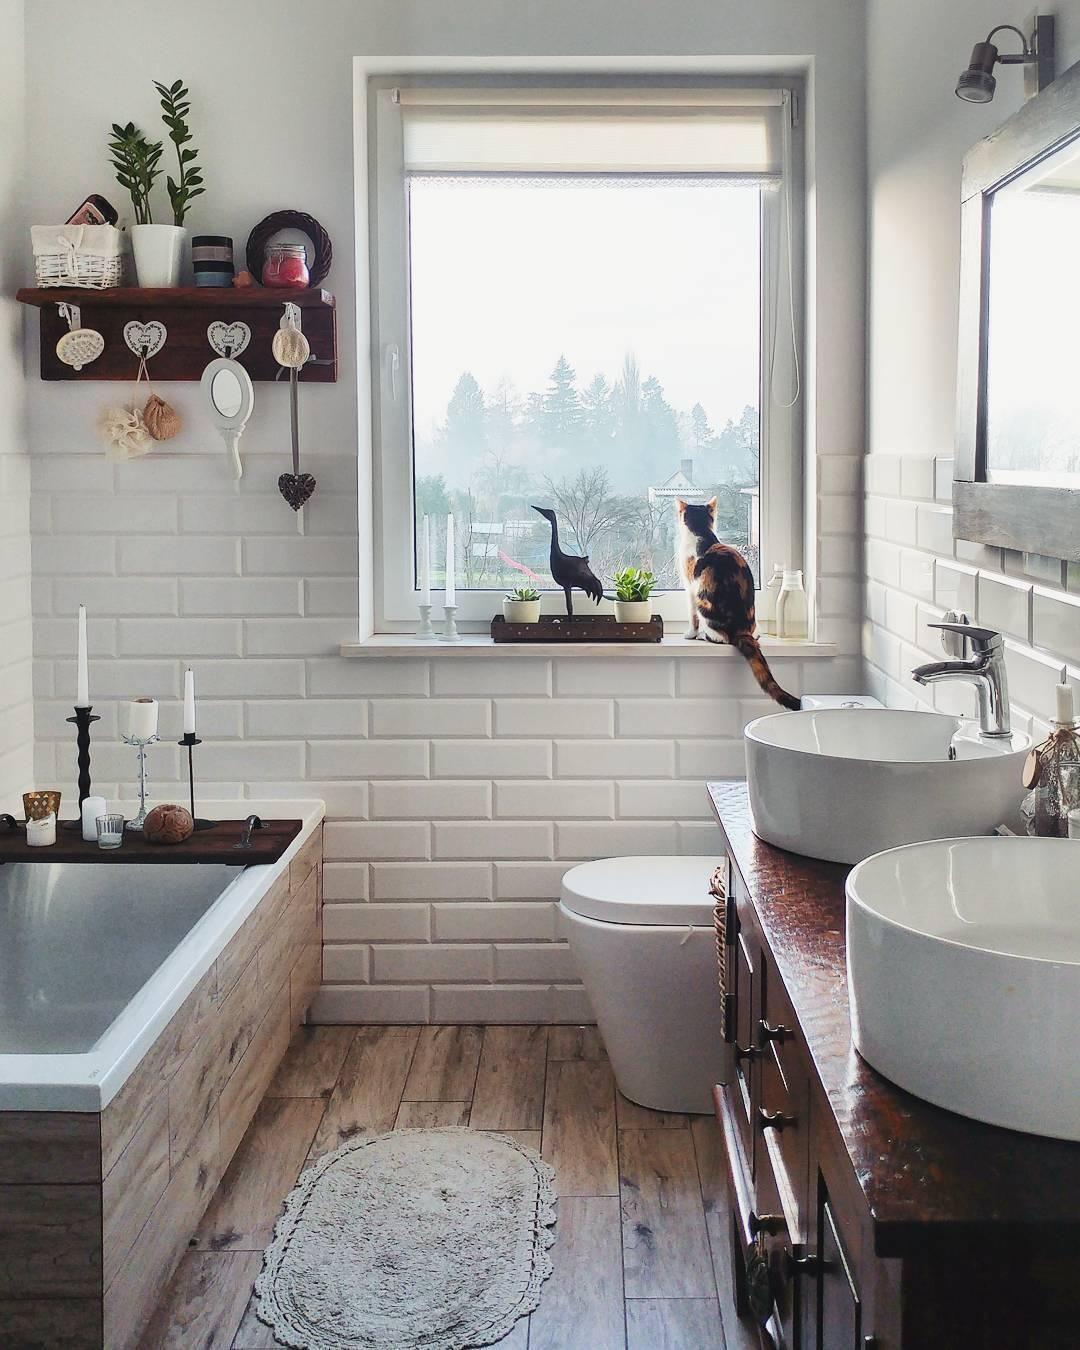 Kerzenhalter Darla Elegante Badezimmerdeko Badezimmer Rustikal Rustikale Bader